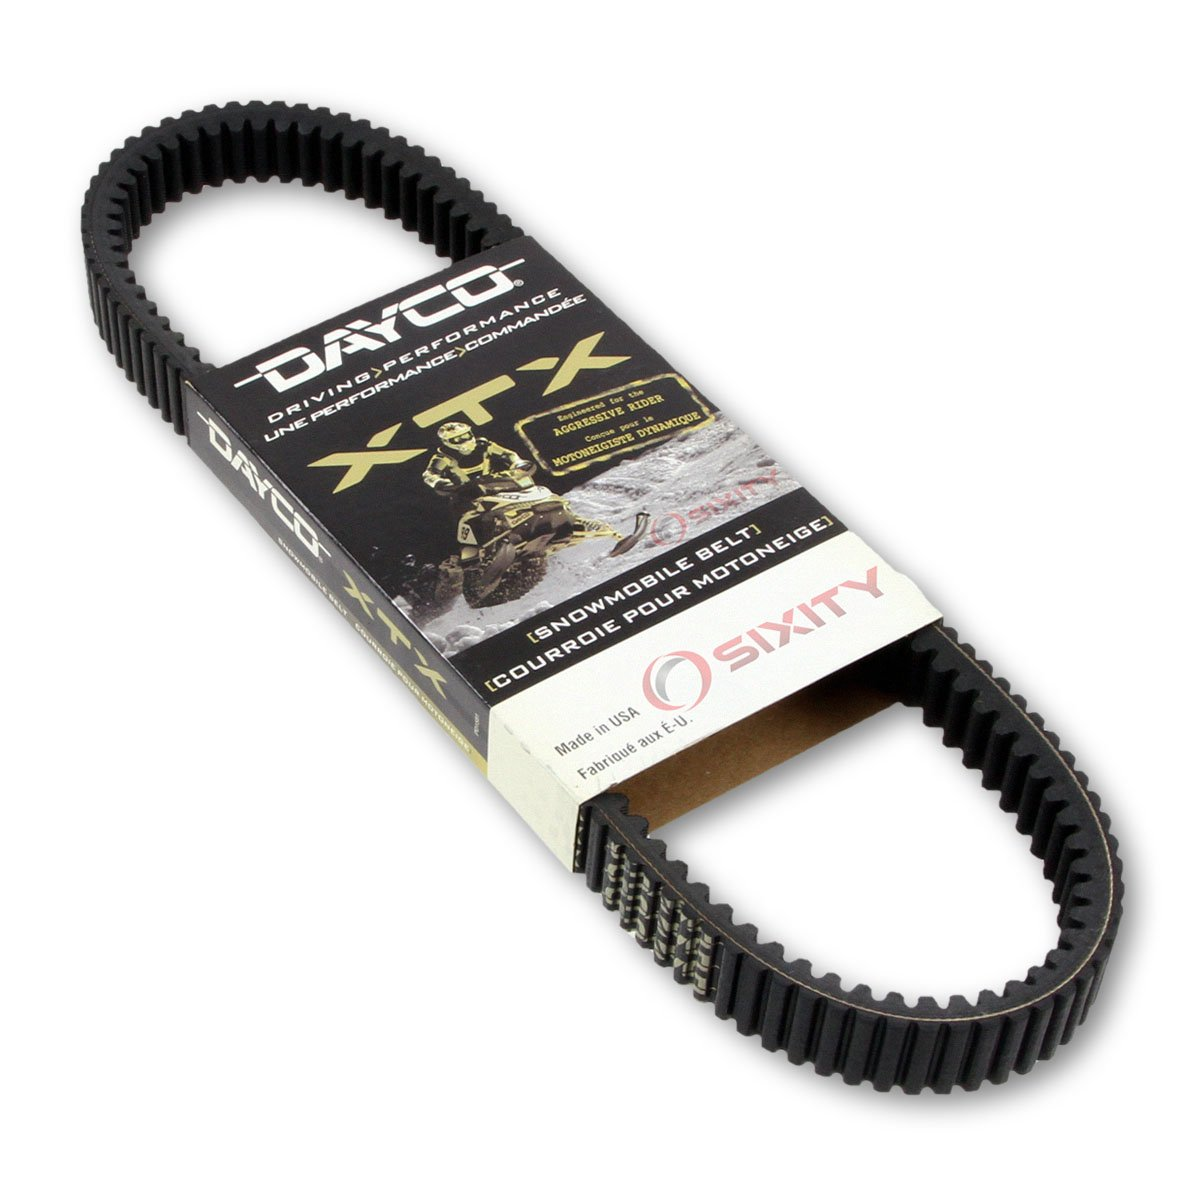 2011-2015 Polaris 800 SwitchBack Assault 144 Drive Belt Dayco XTX Snowmobile OEM Upgrade Replacement Transmission Belts